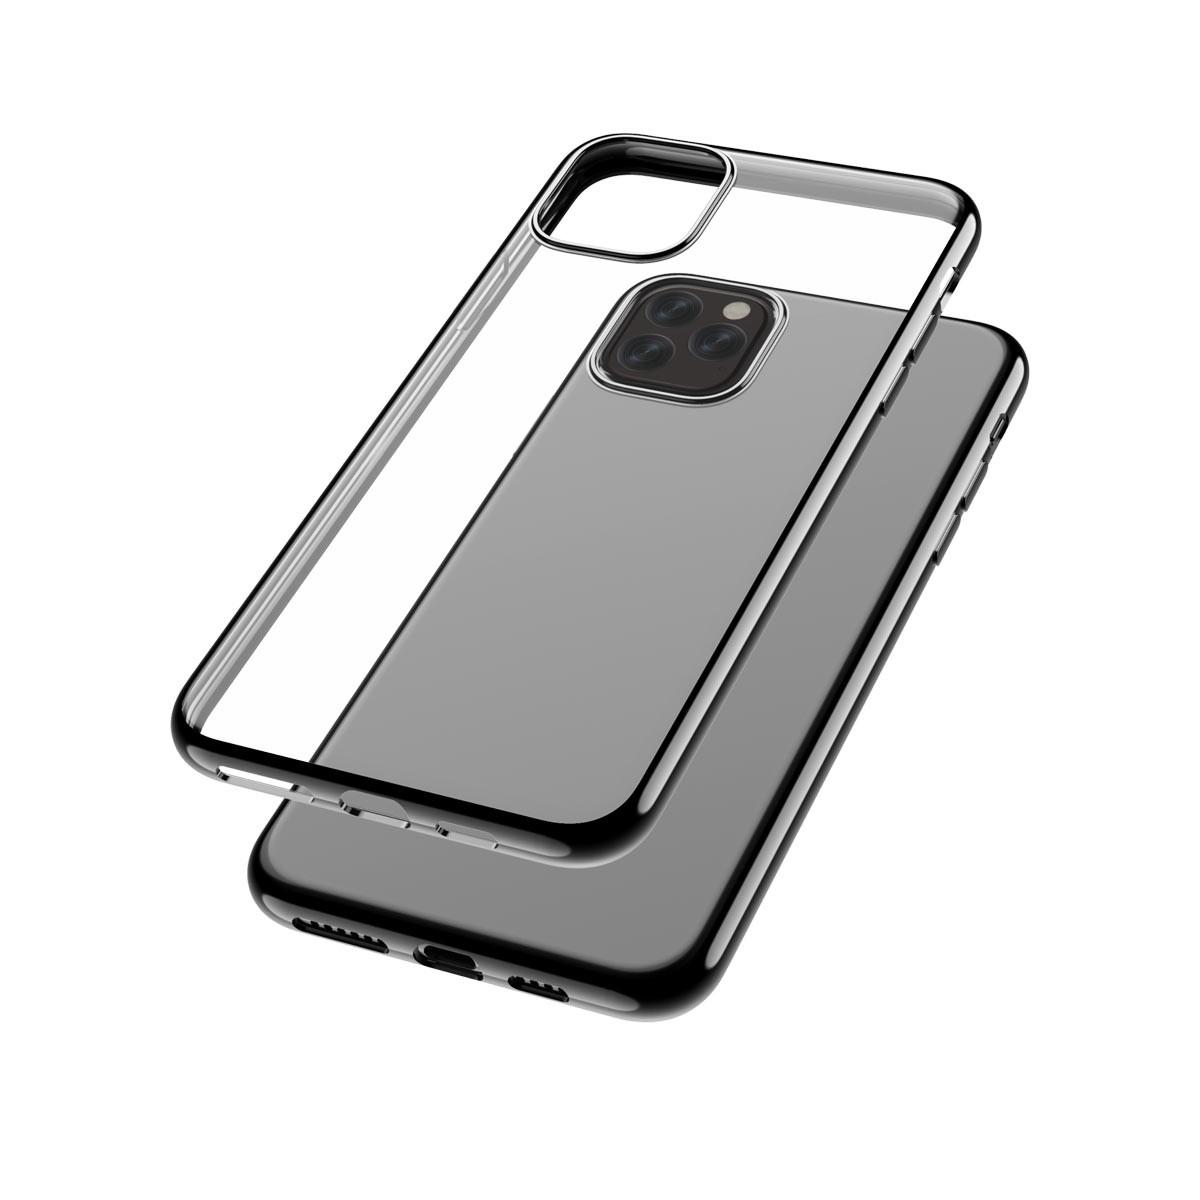 Capac protectie spate cellara colectia electro pentru iphone 11 pro - negru